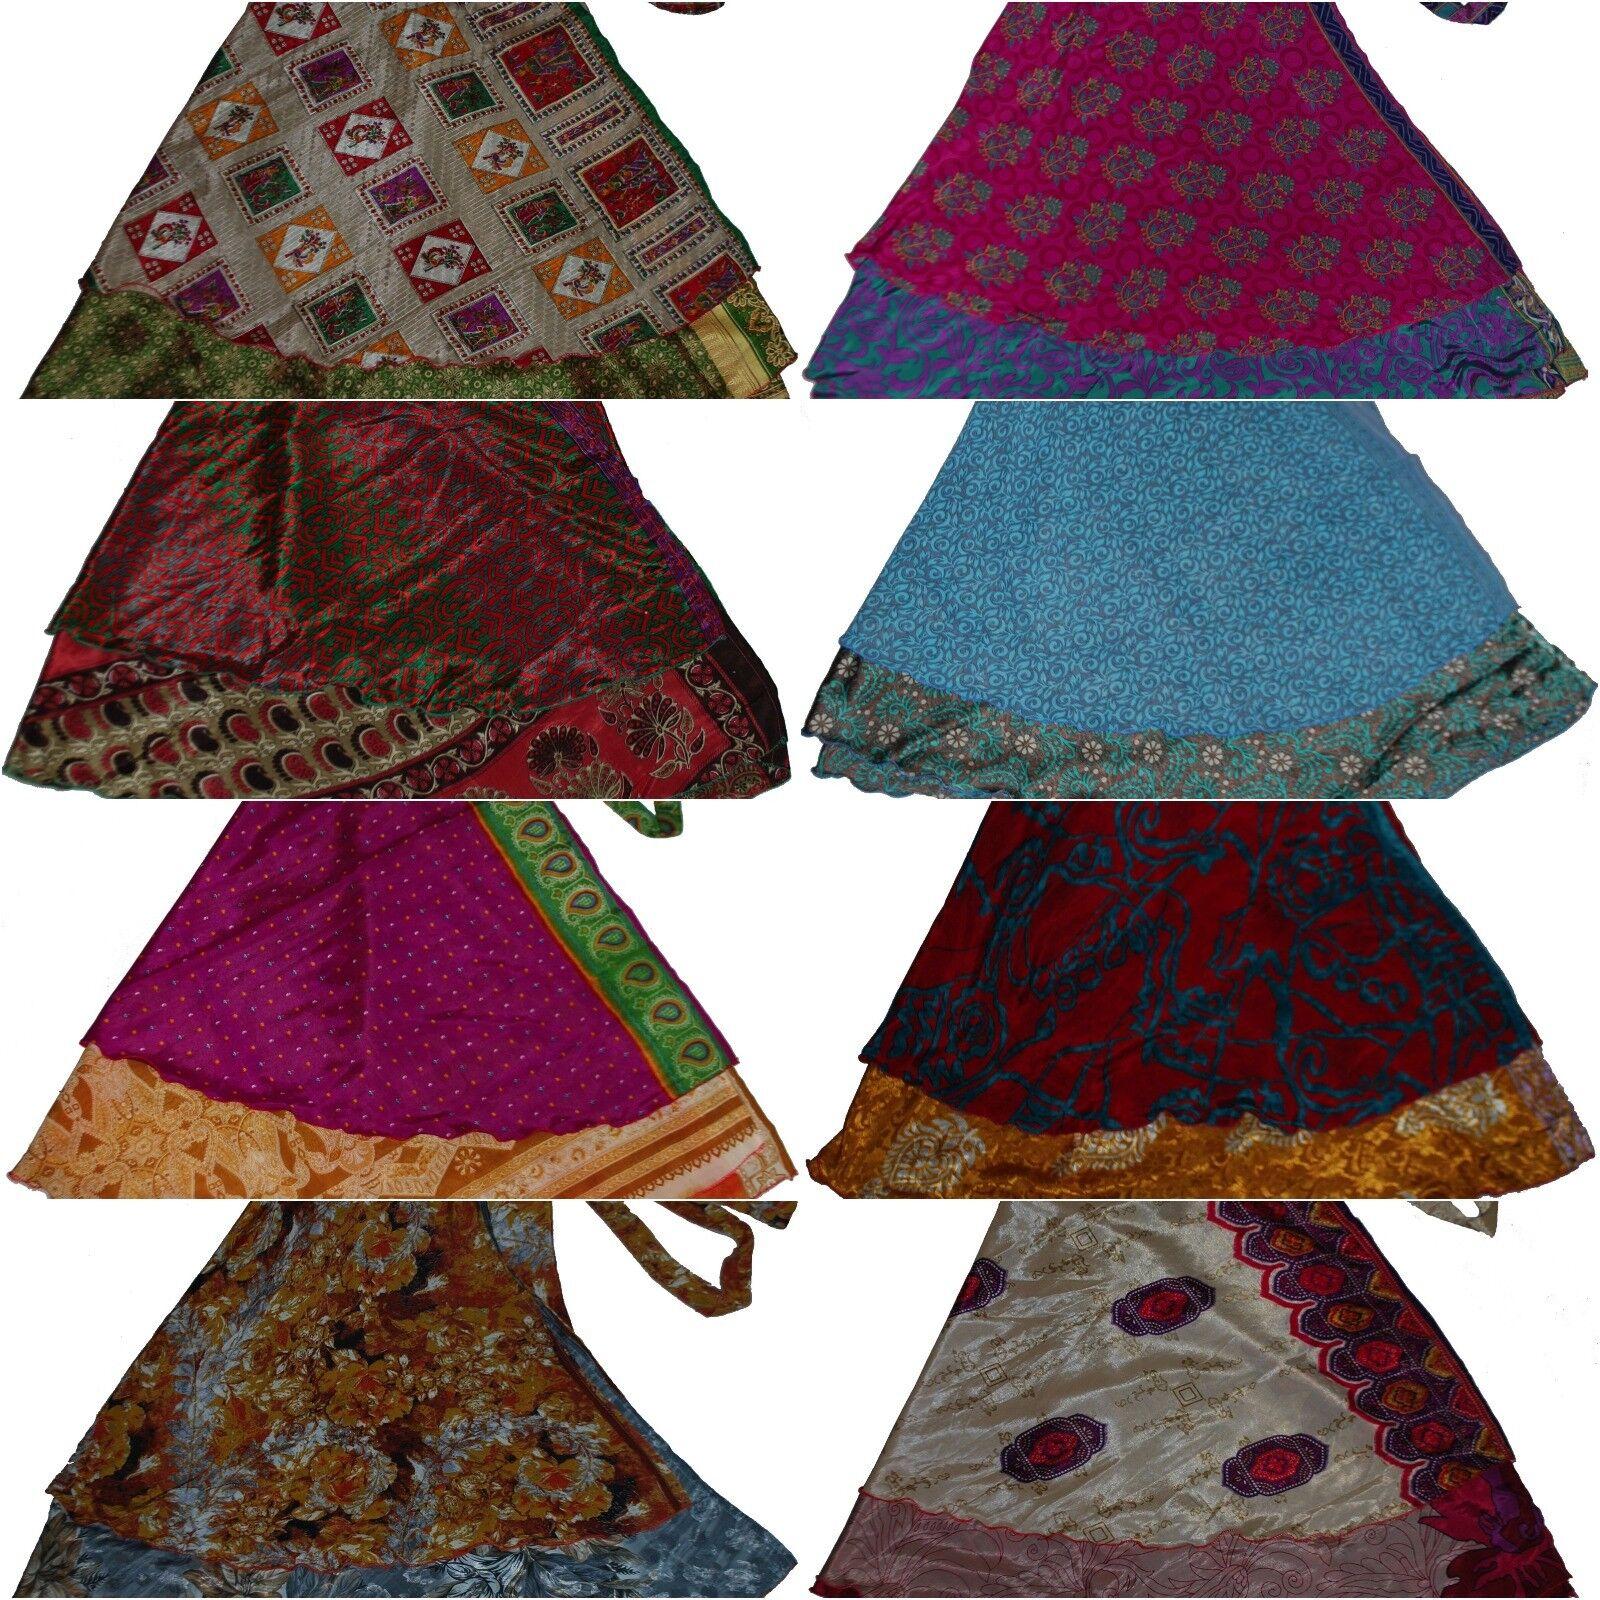 Wholesale Lot Of 10 Pcs Vintage Reversible Sari Magic Wrap Skirts 36